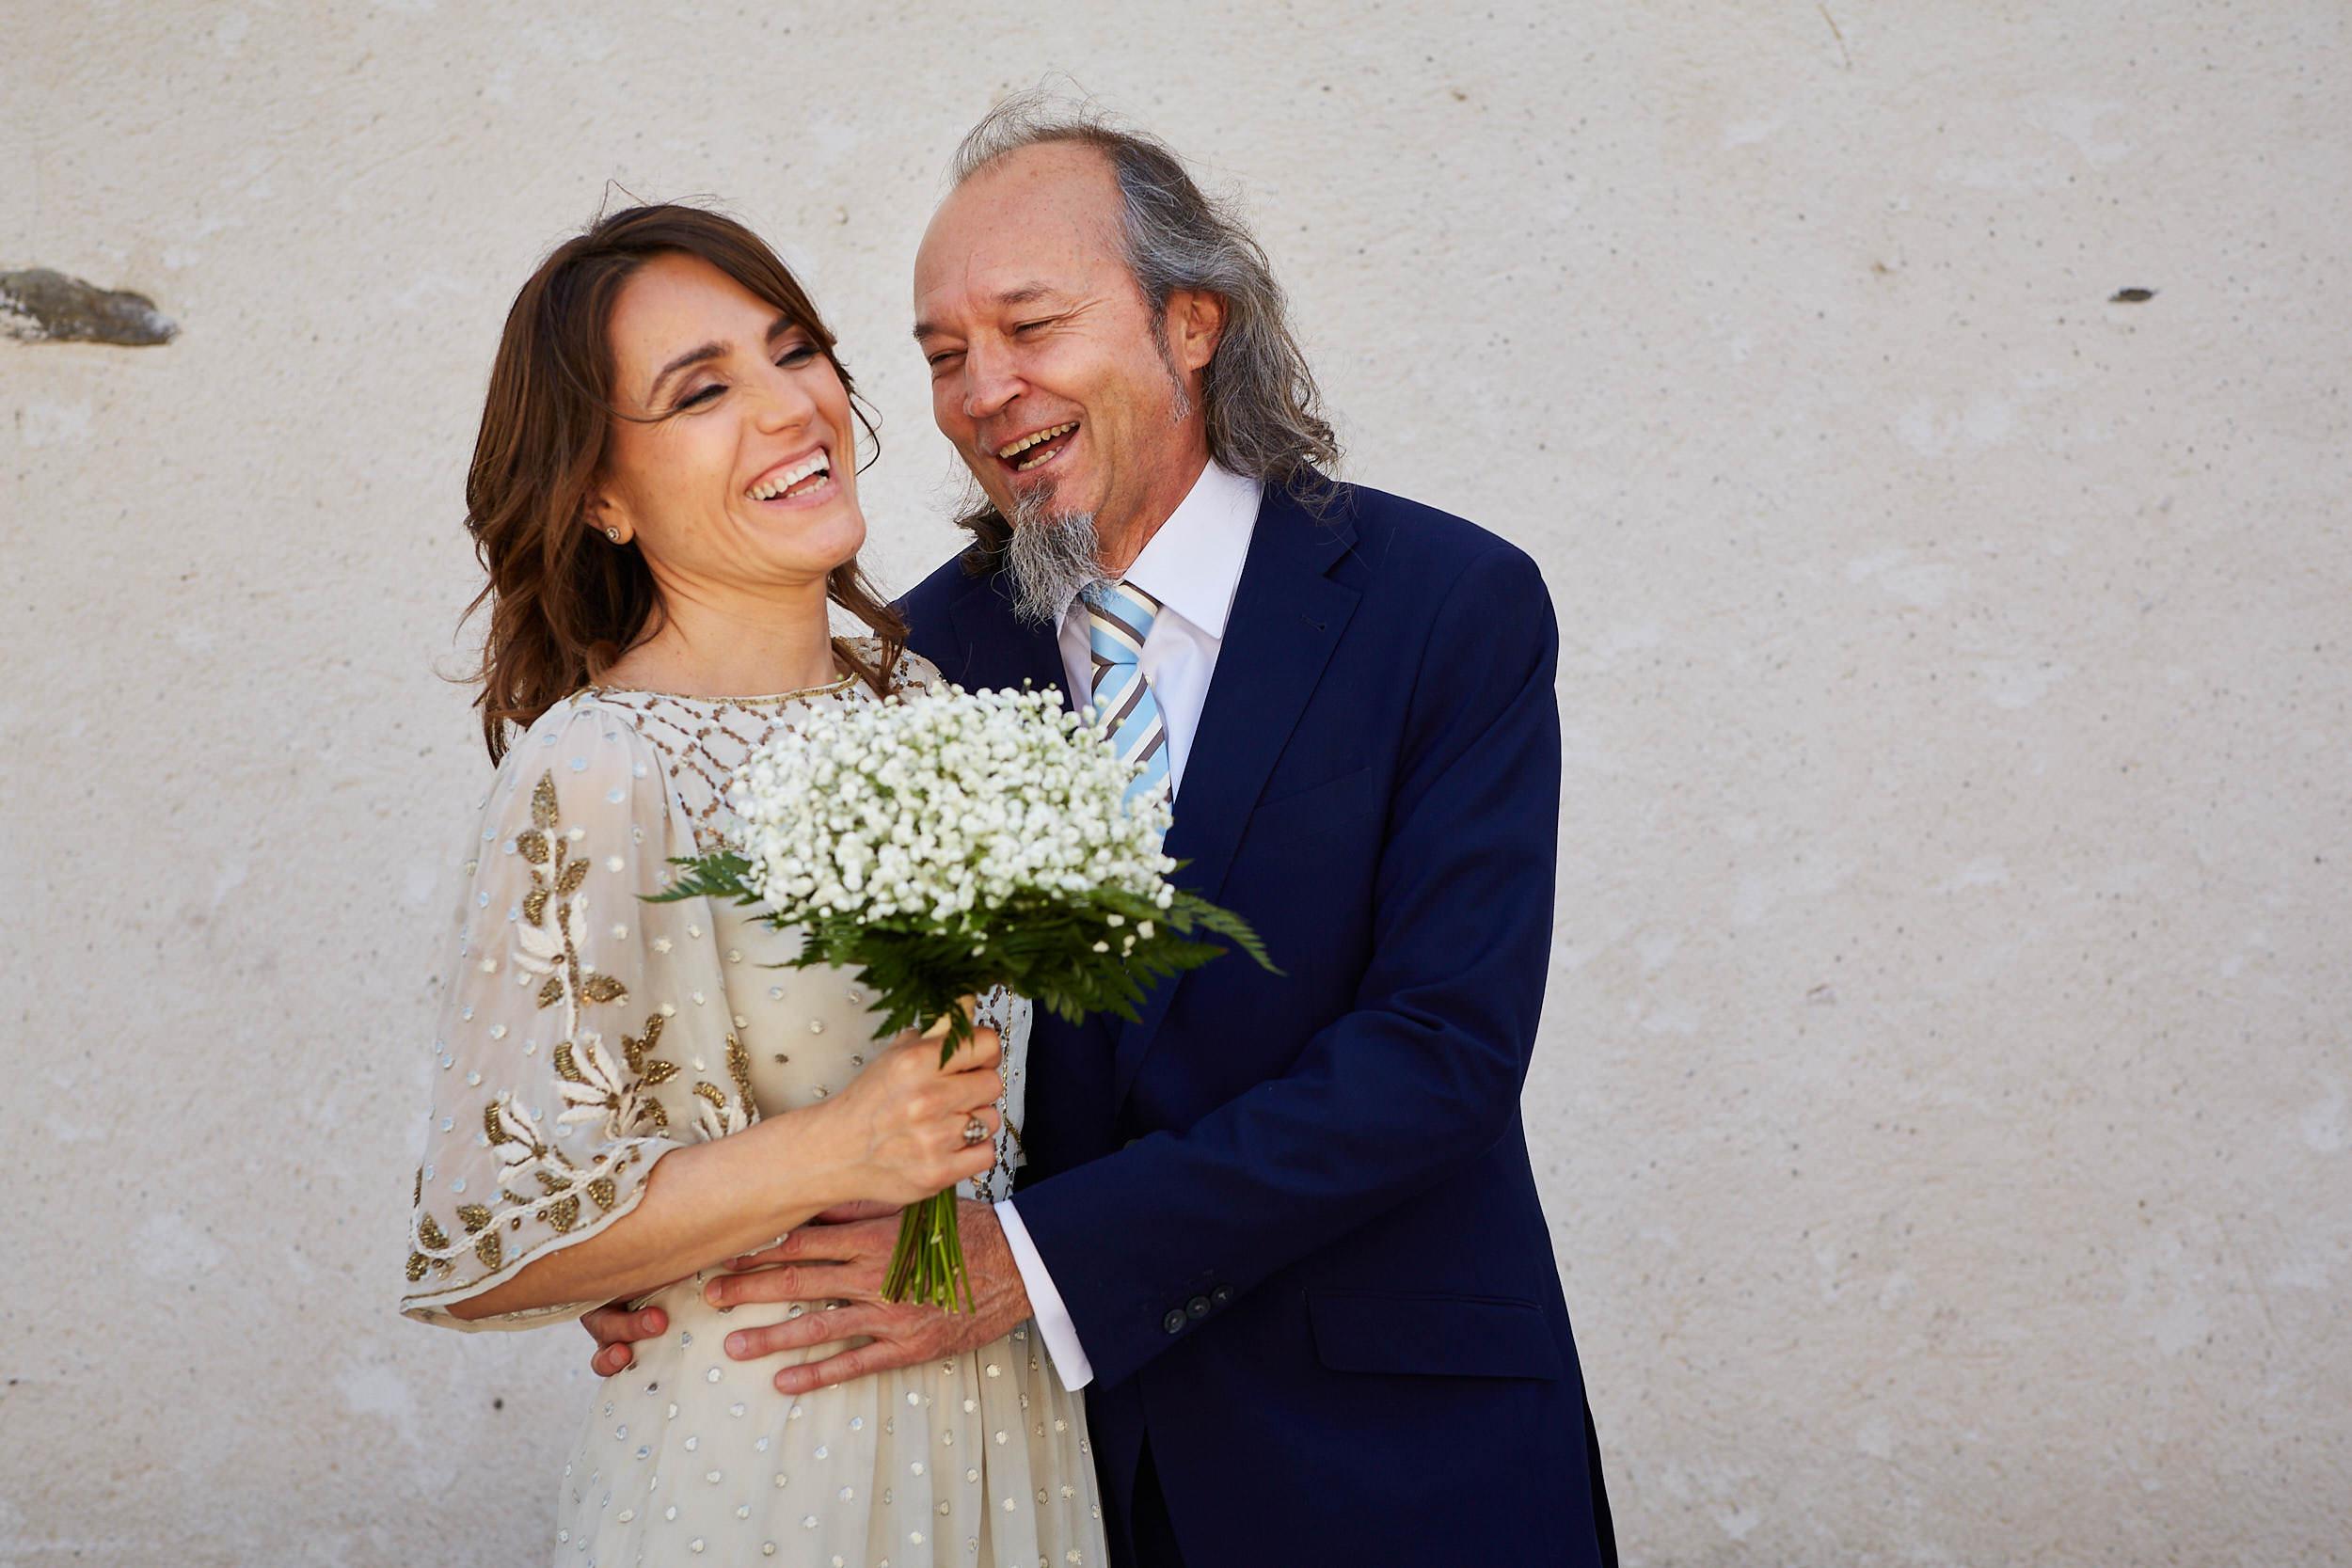 Wedding_Rioja_Basque_Country_Spain_James_Sturcke19.jpg